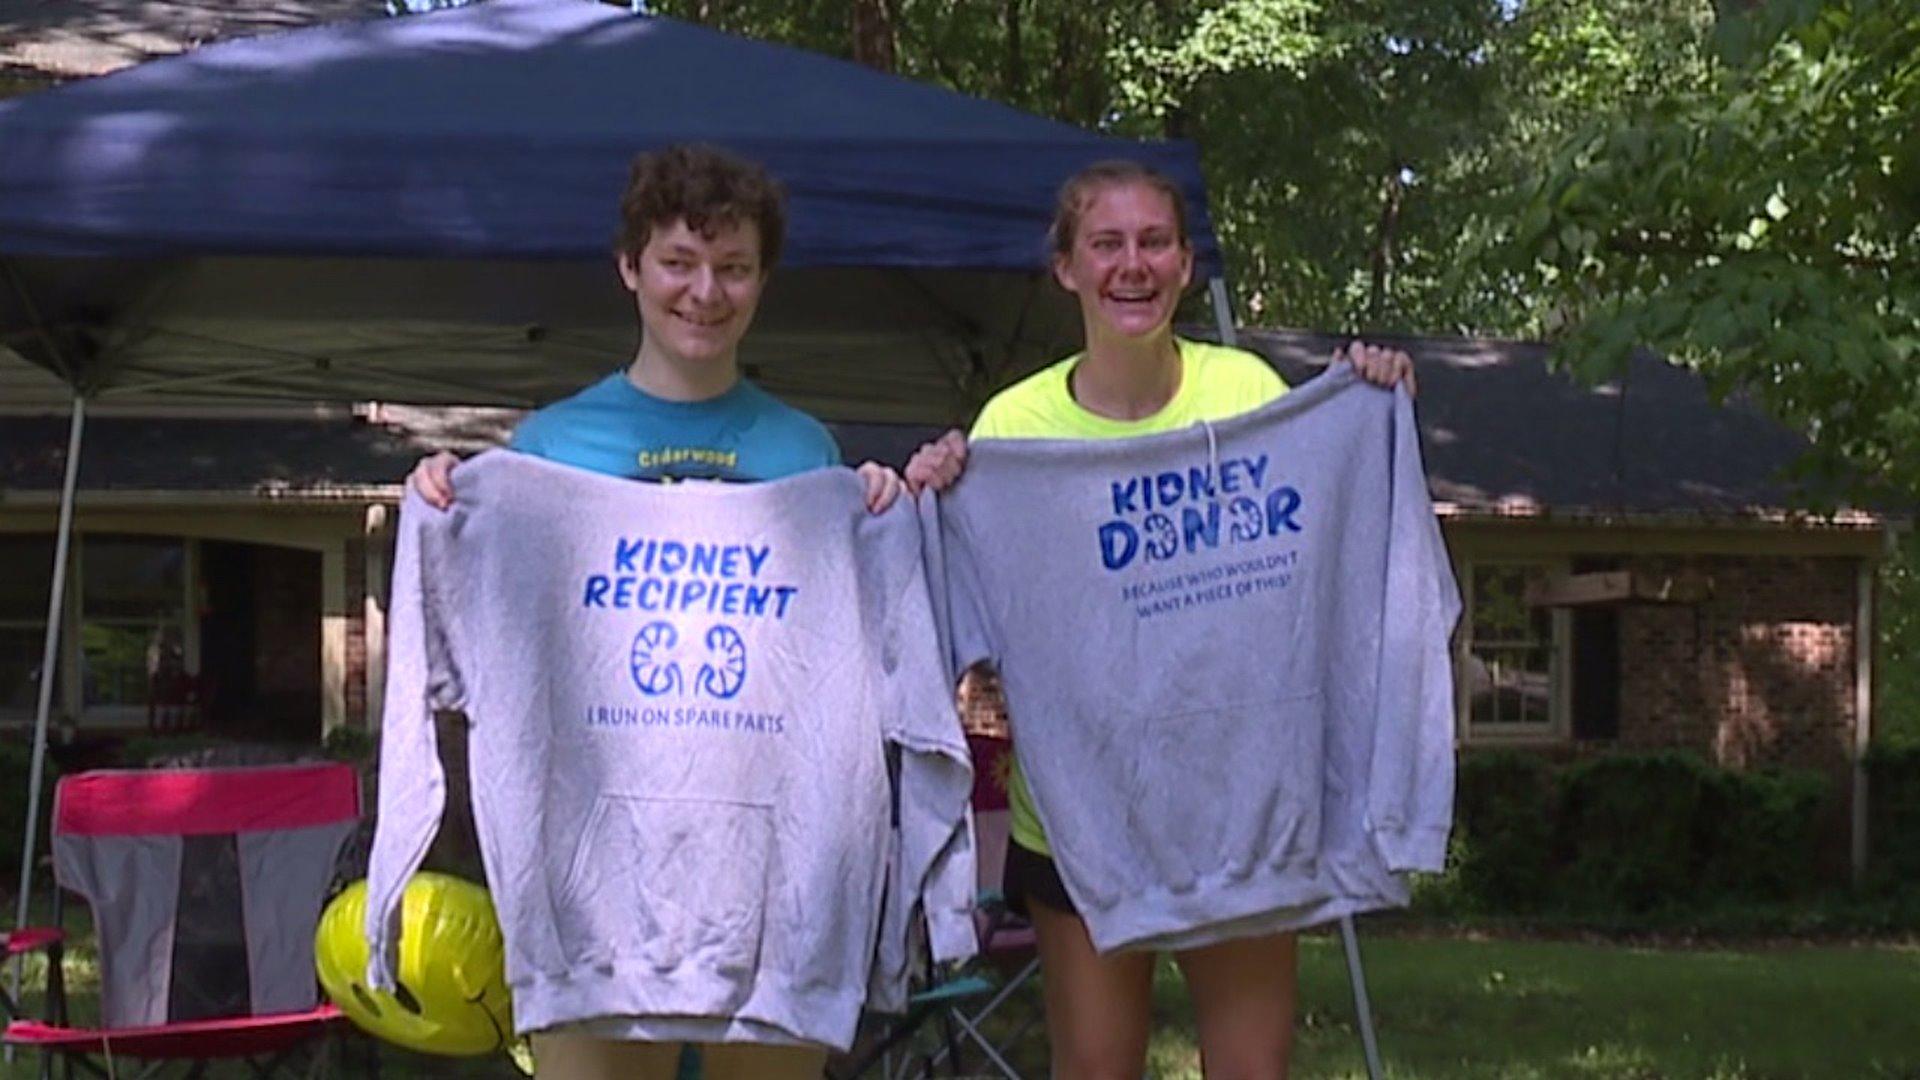 Jamestown lifeguard donates kidney to teenage teammate facing kidney failure